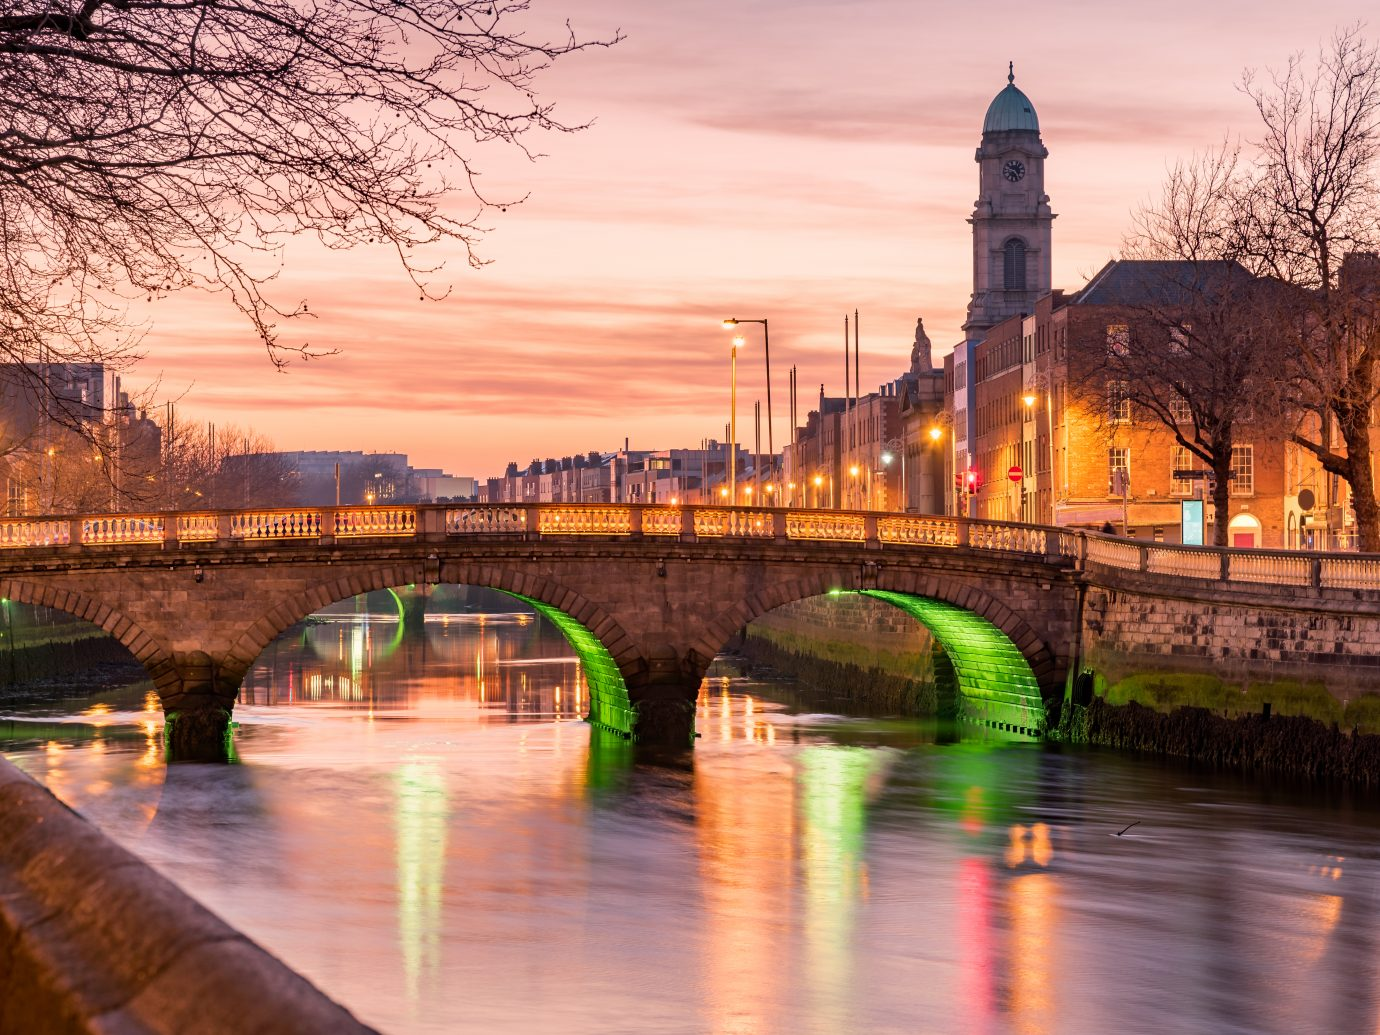 Grattan Bridge in Dublin, Ireland on the evening .This historic bridge spans the River Liffey in Dublin, Ireland.